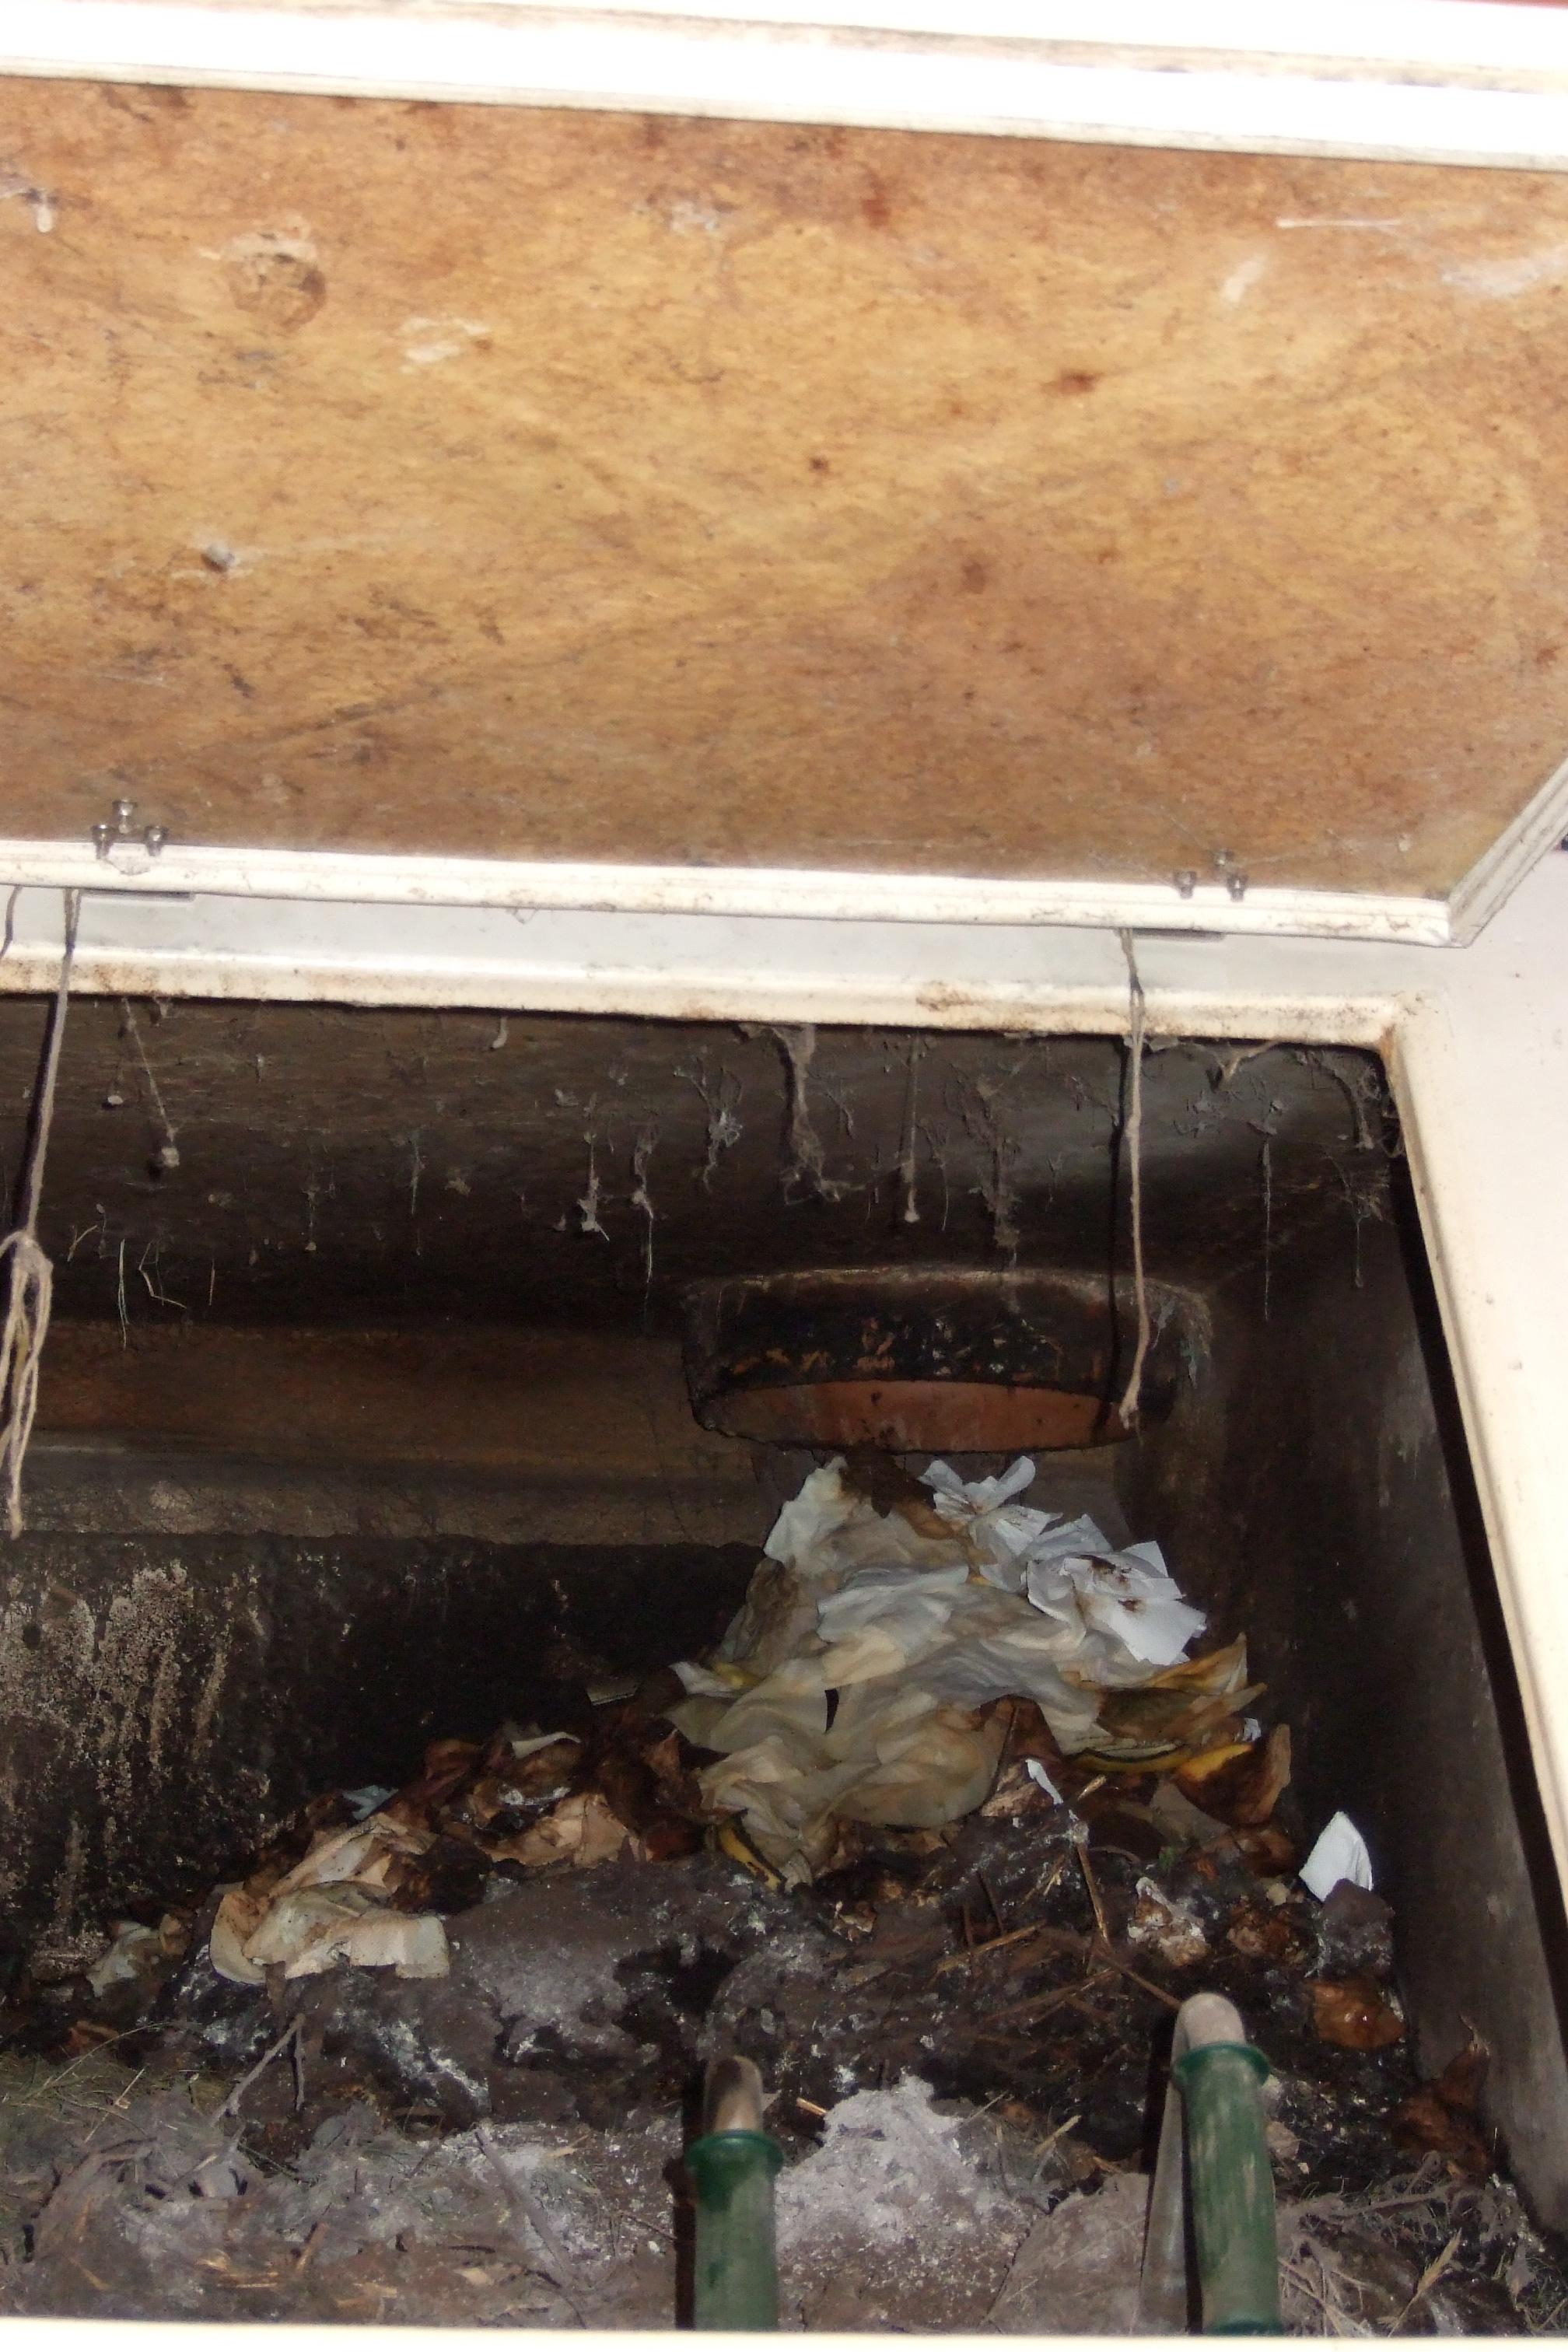 File:Hamburg-Allermöhe, composting chamber for excreta, toilet paper ...